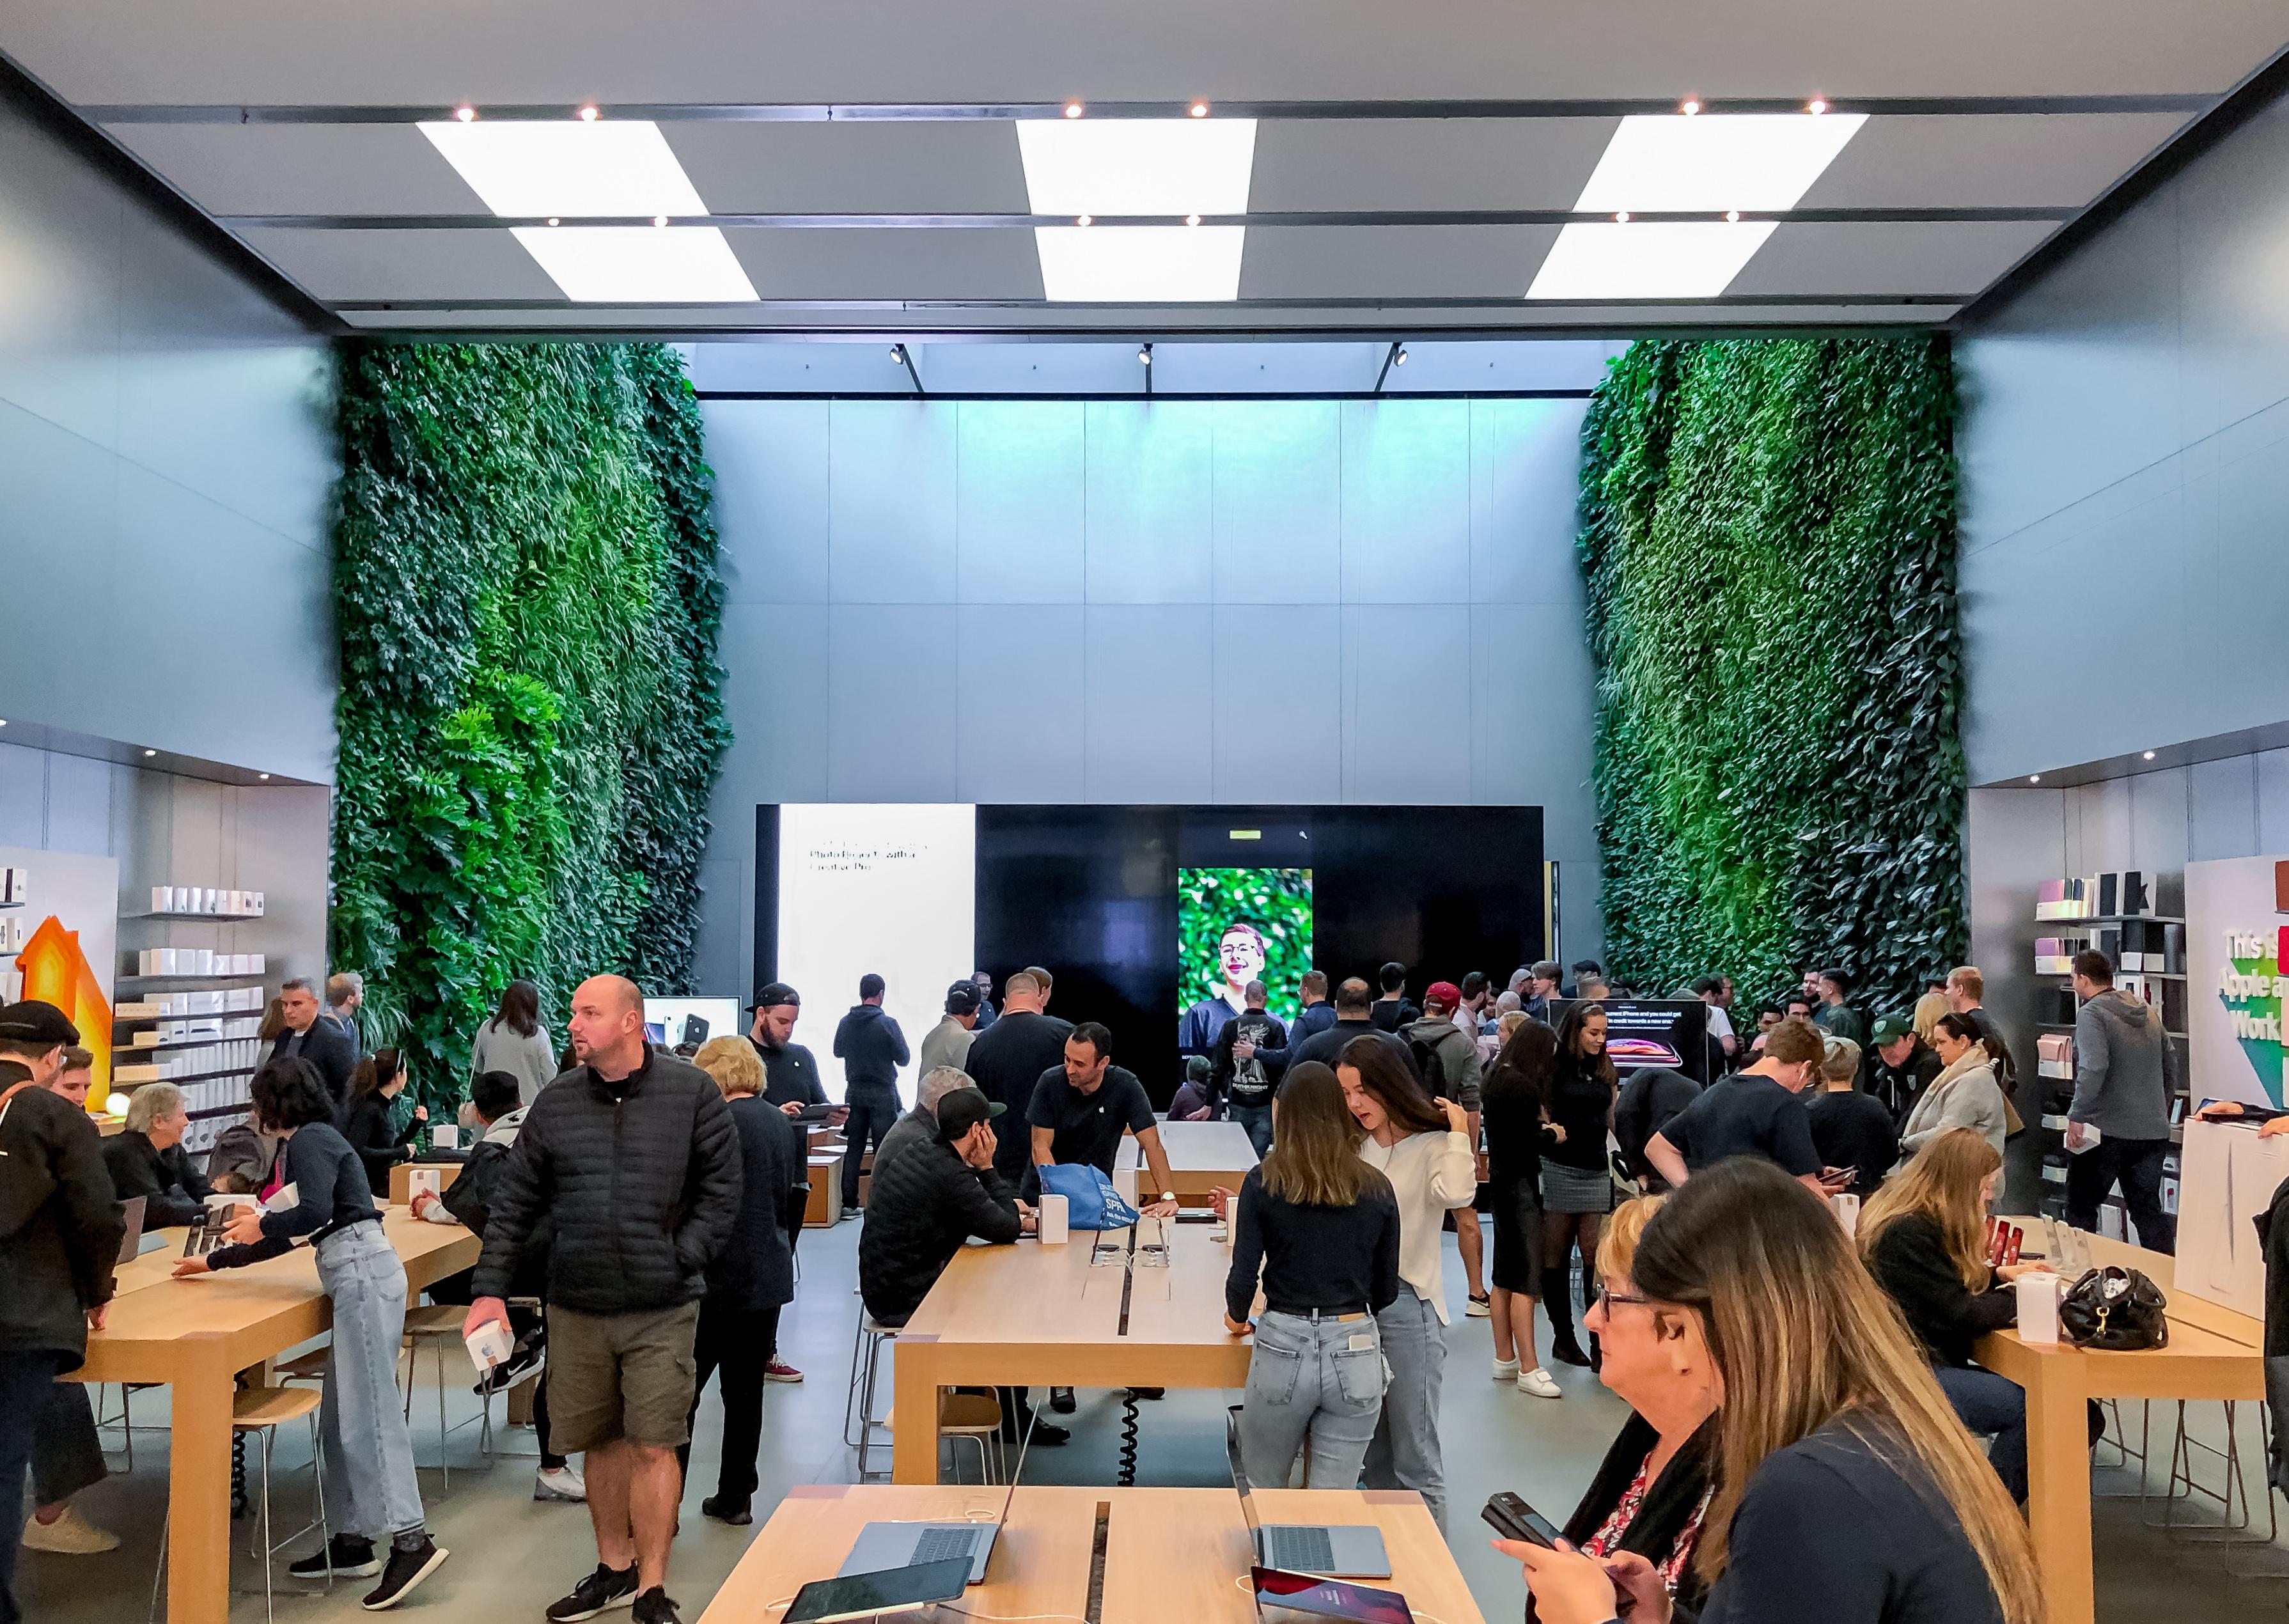 Bondi Apple Store Upgrade Features Floor-to-ceiling Green Walls